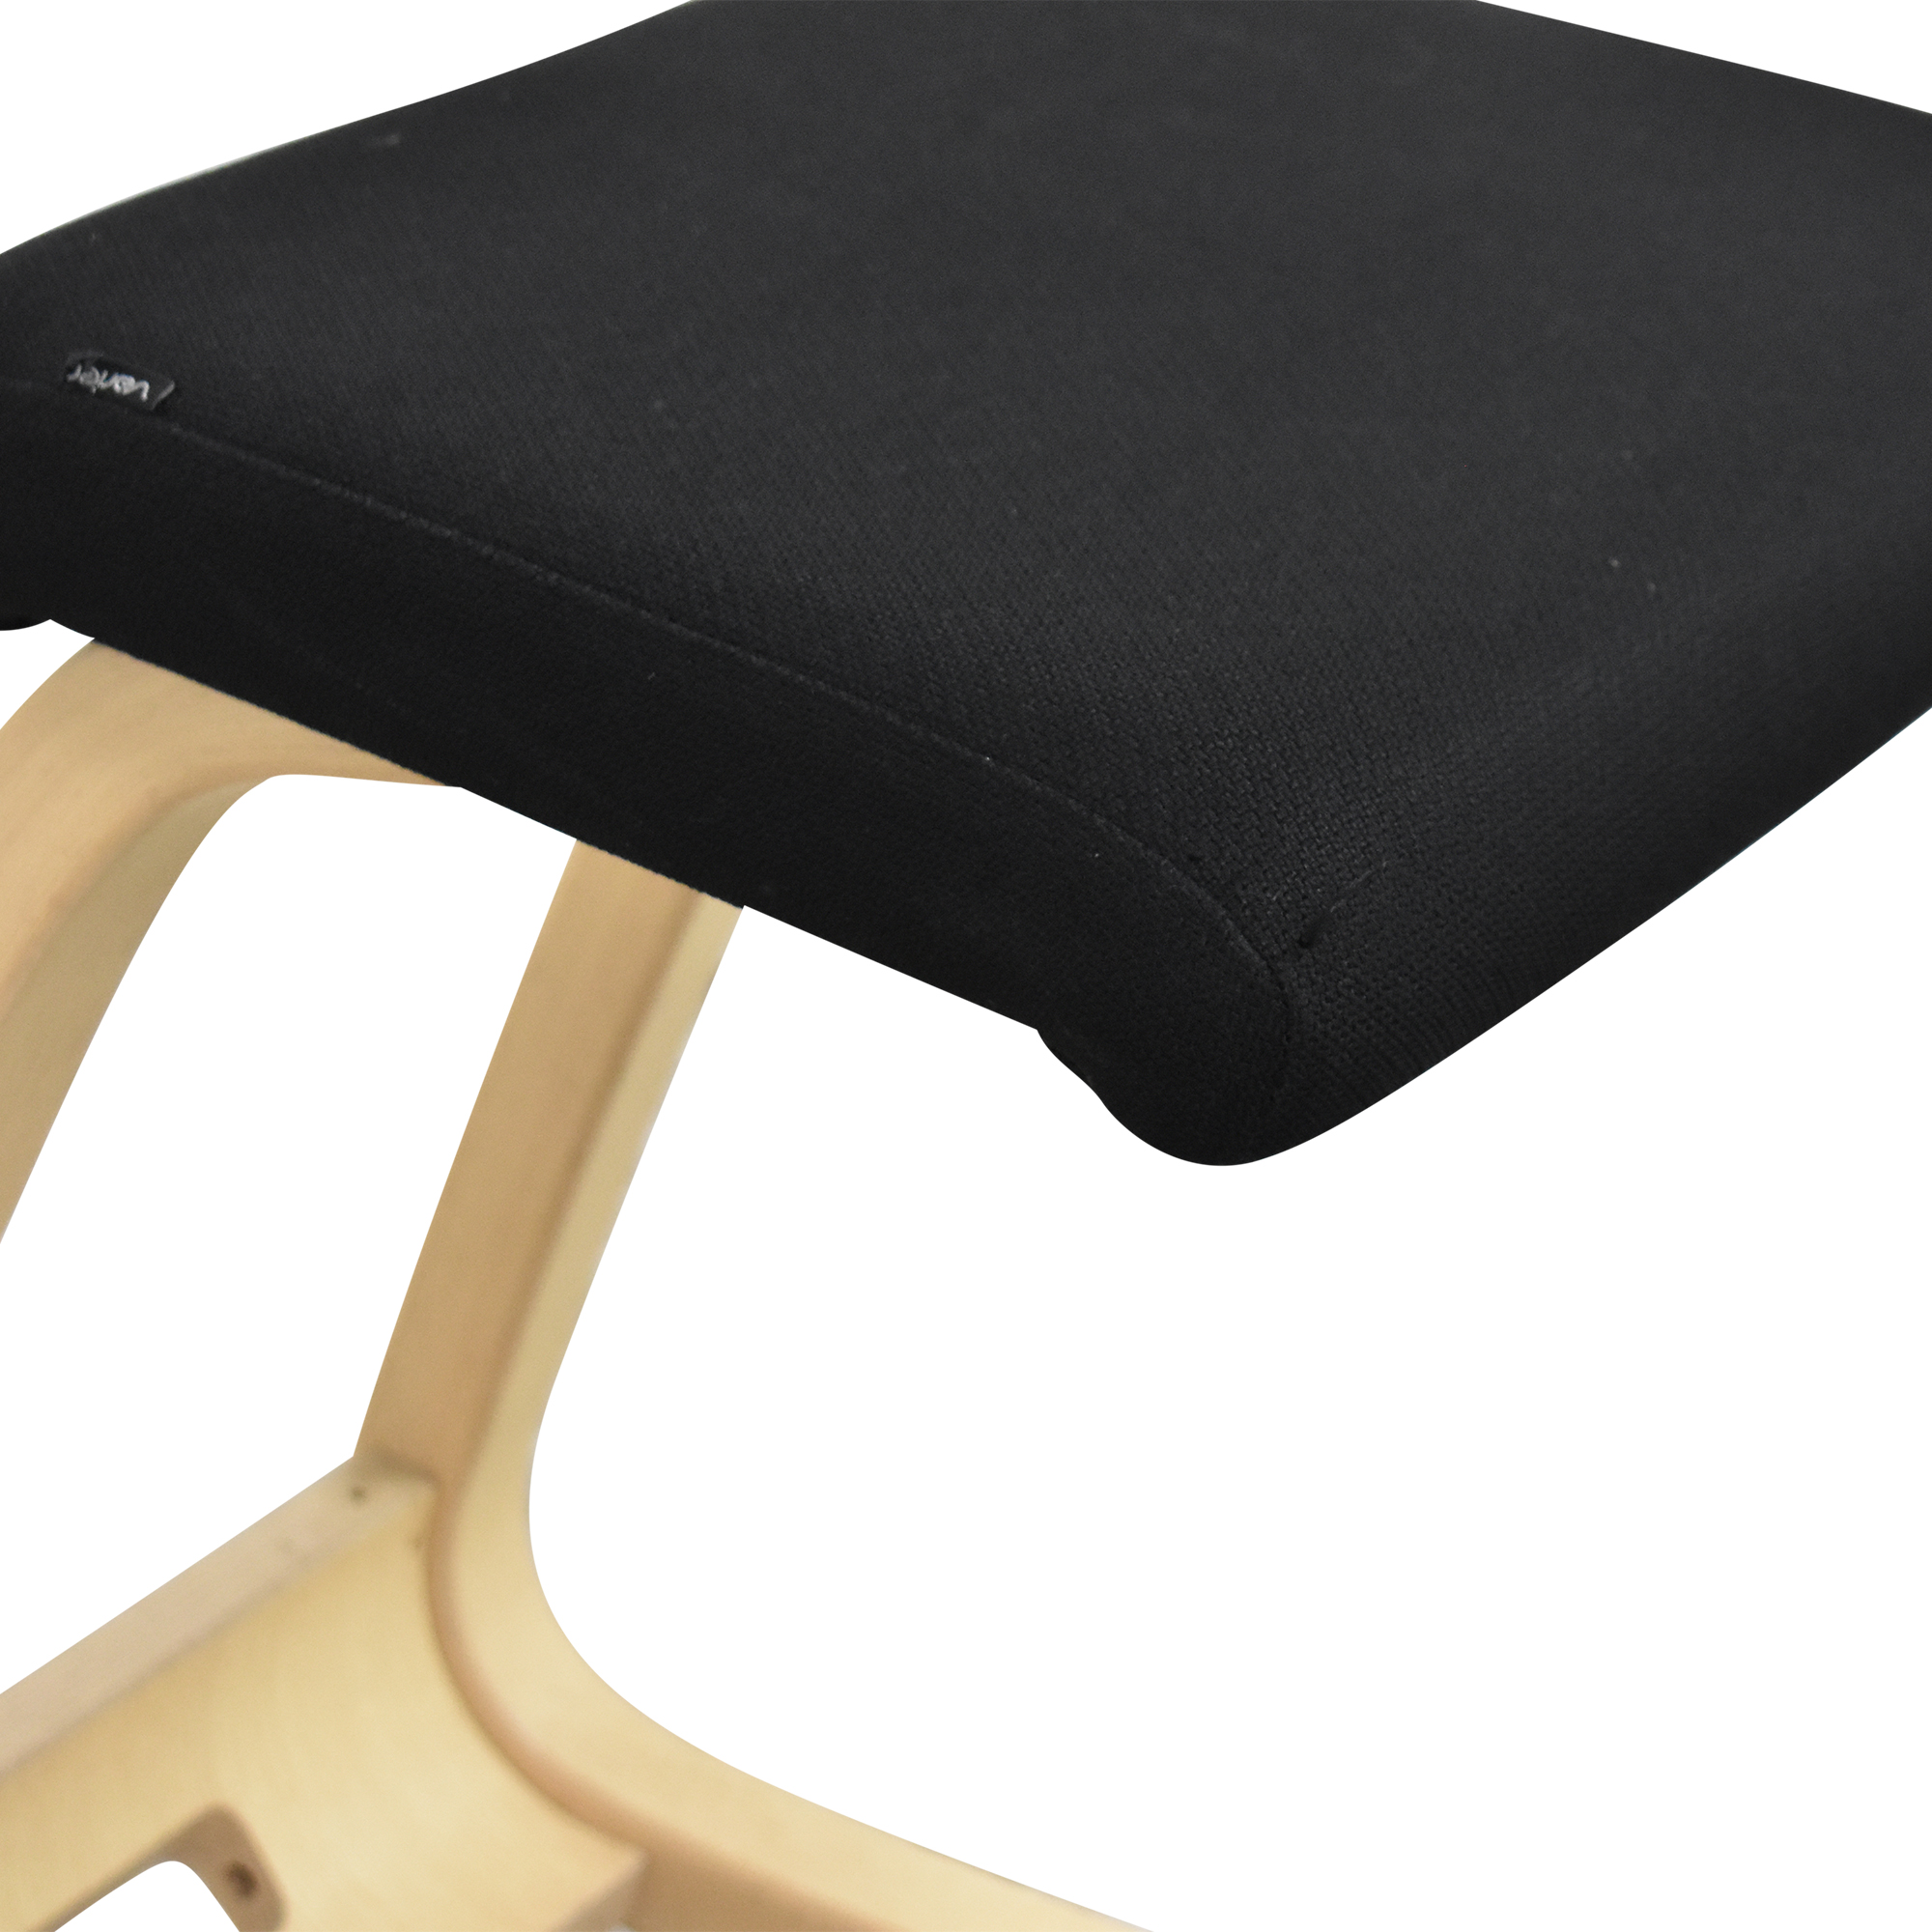 Varier Varier Variable balans Kneeling Chair for sale